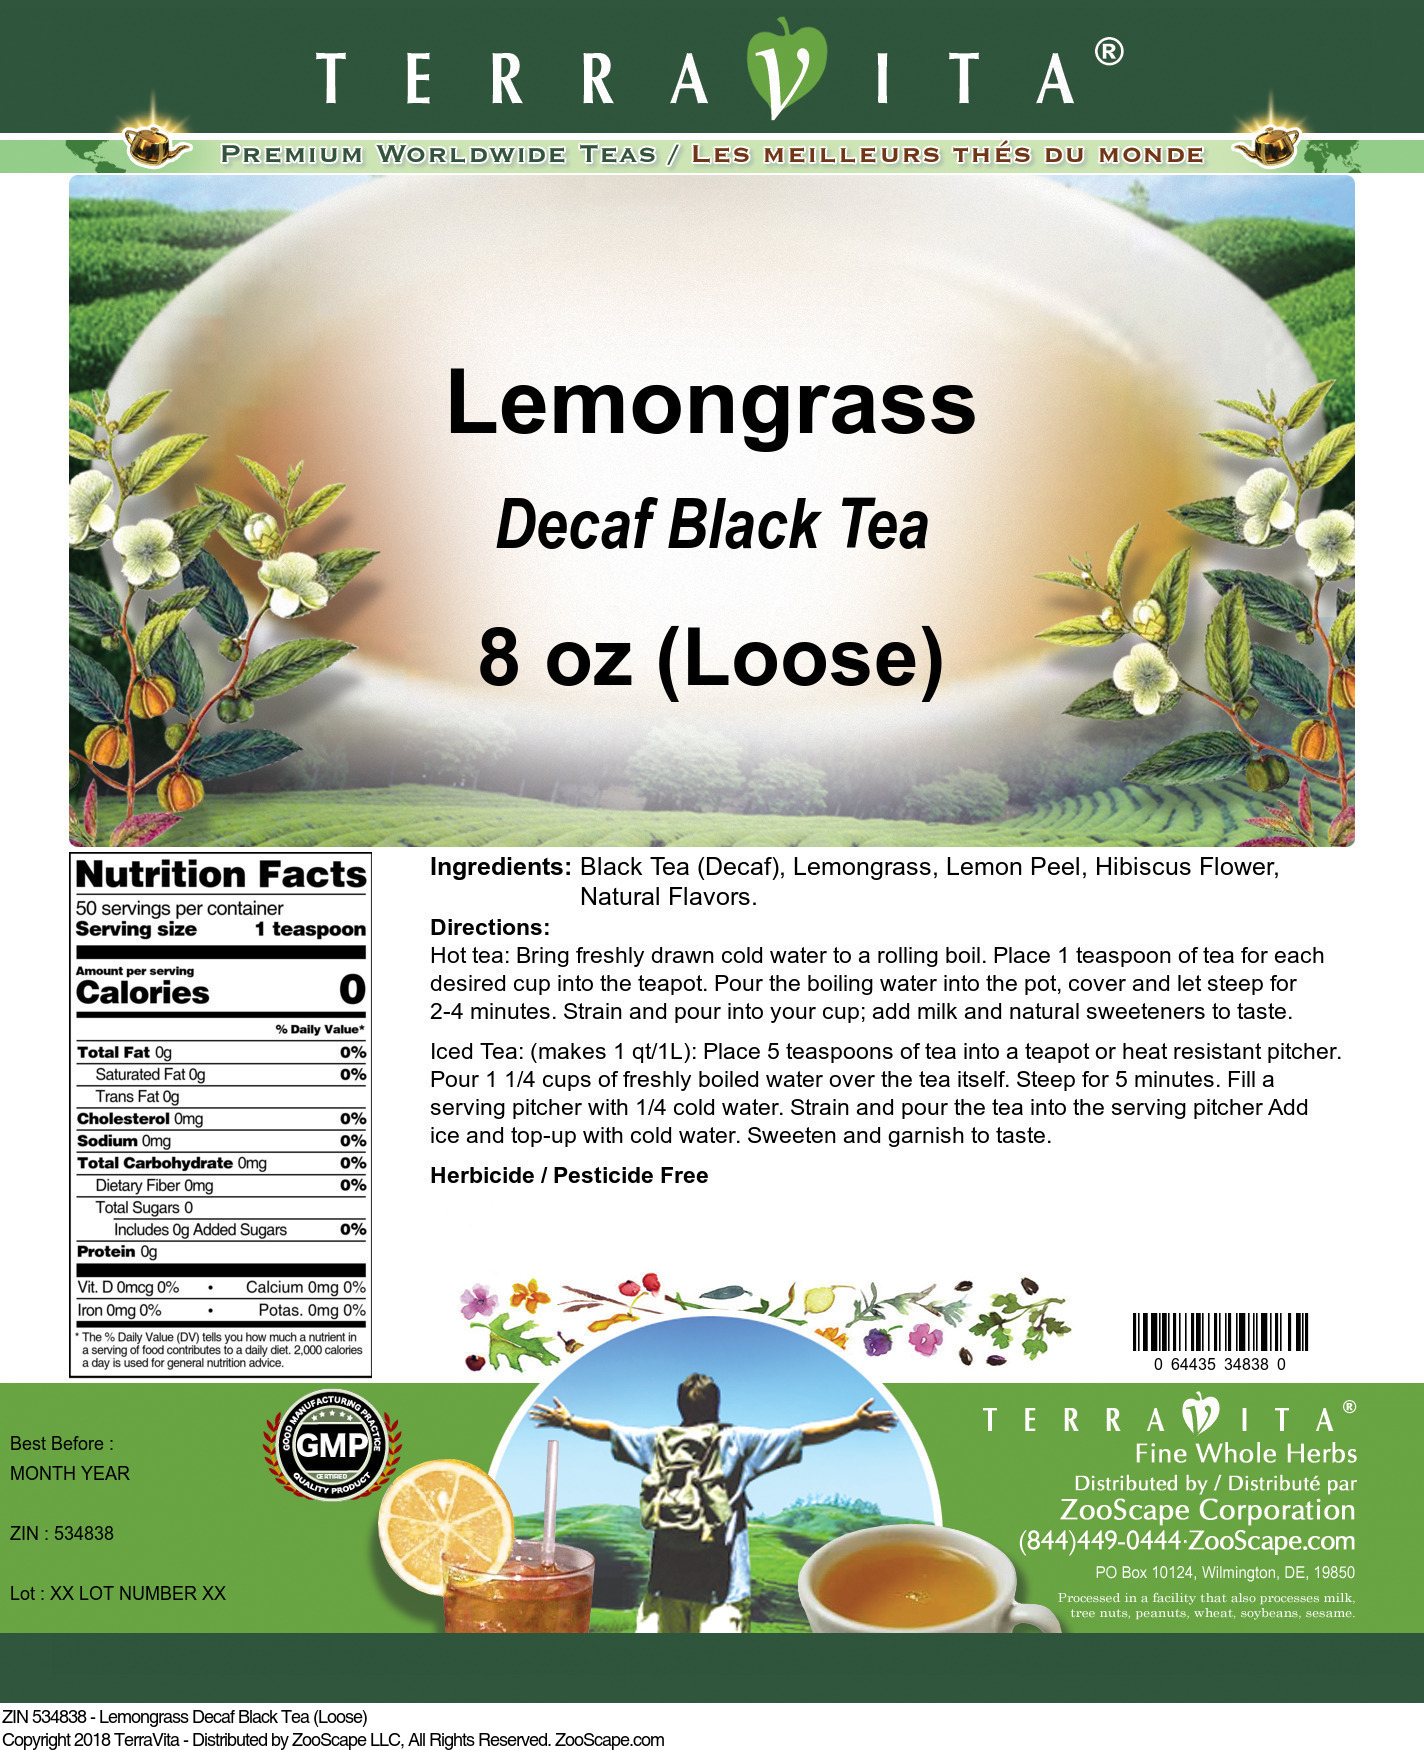 Lemongrass Decaf Black Tea (Loose)